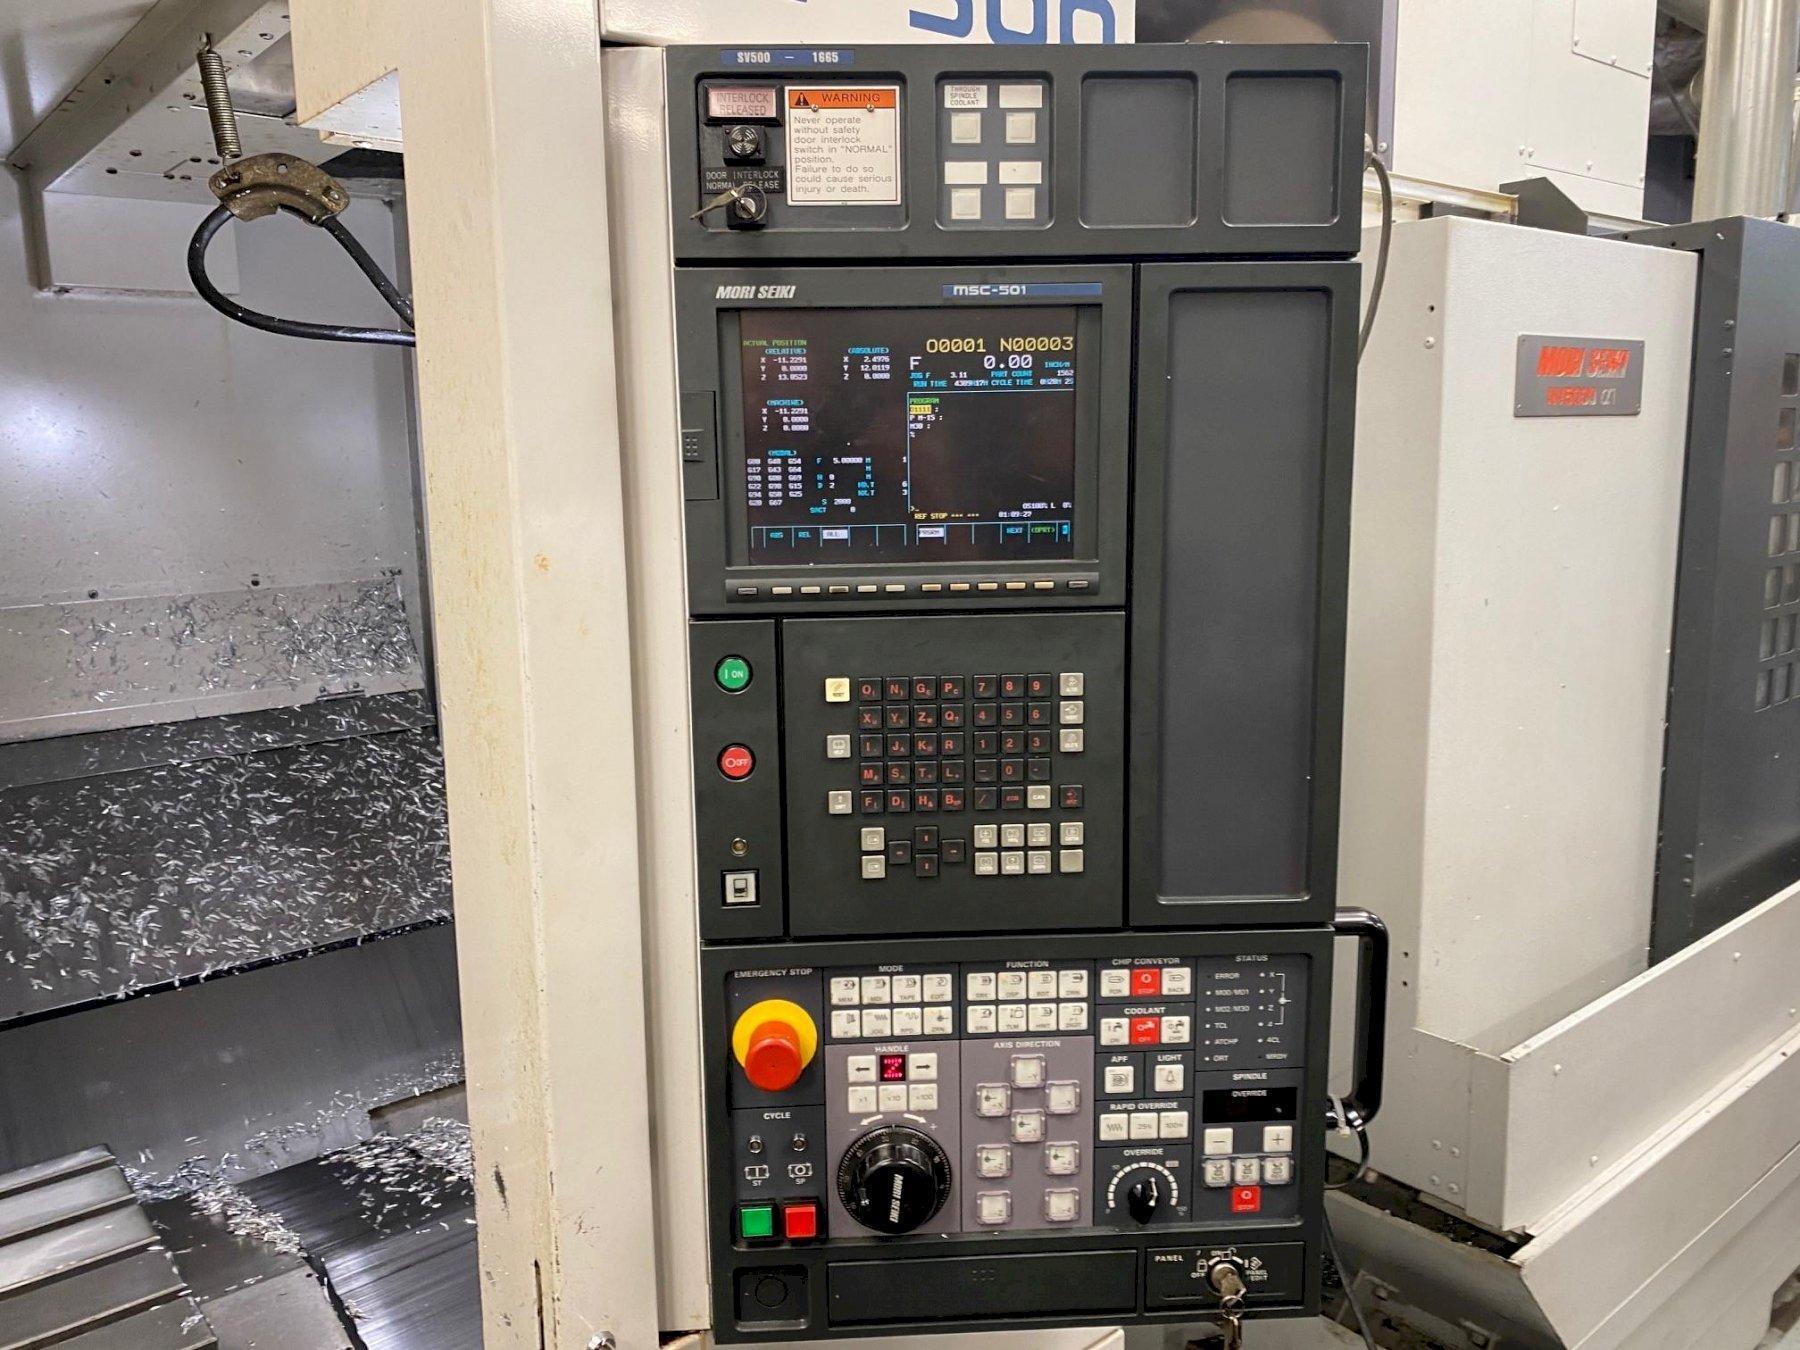 Mori Seiki SV-500 Vertical Machining Center